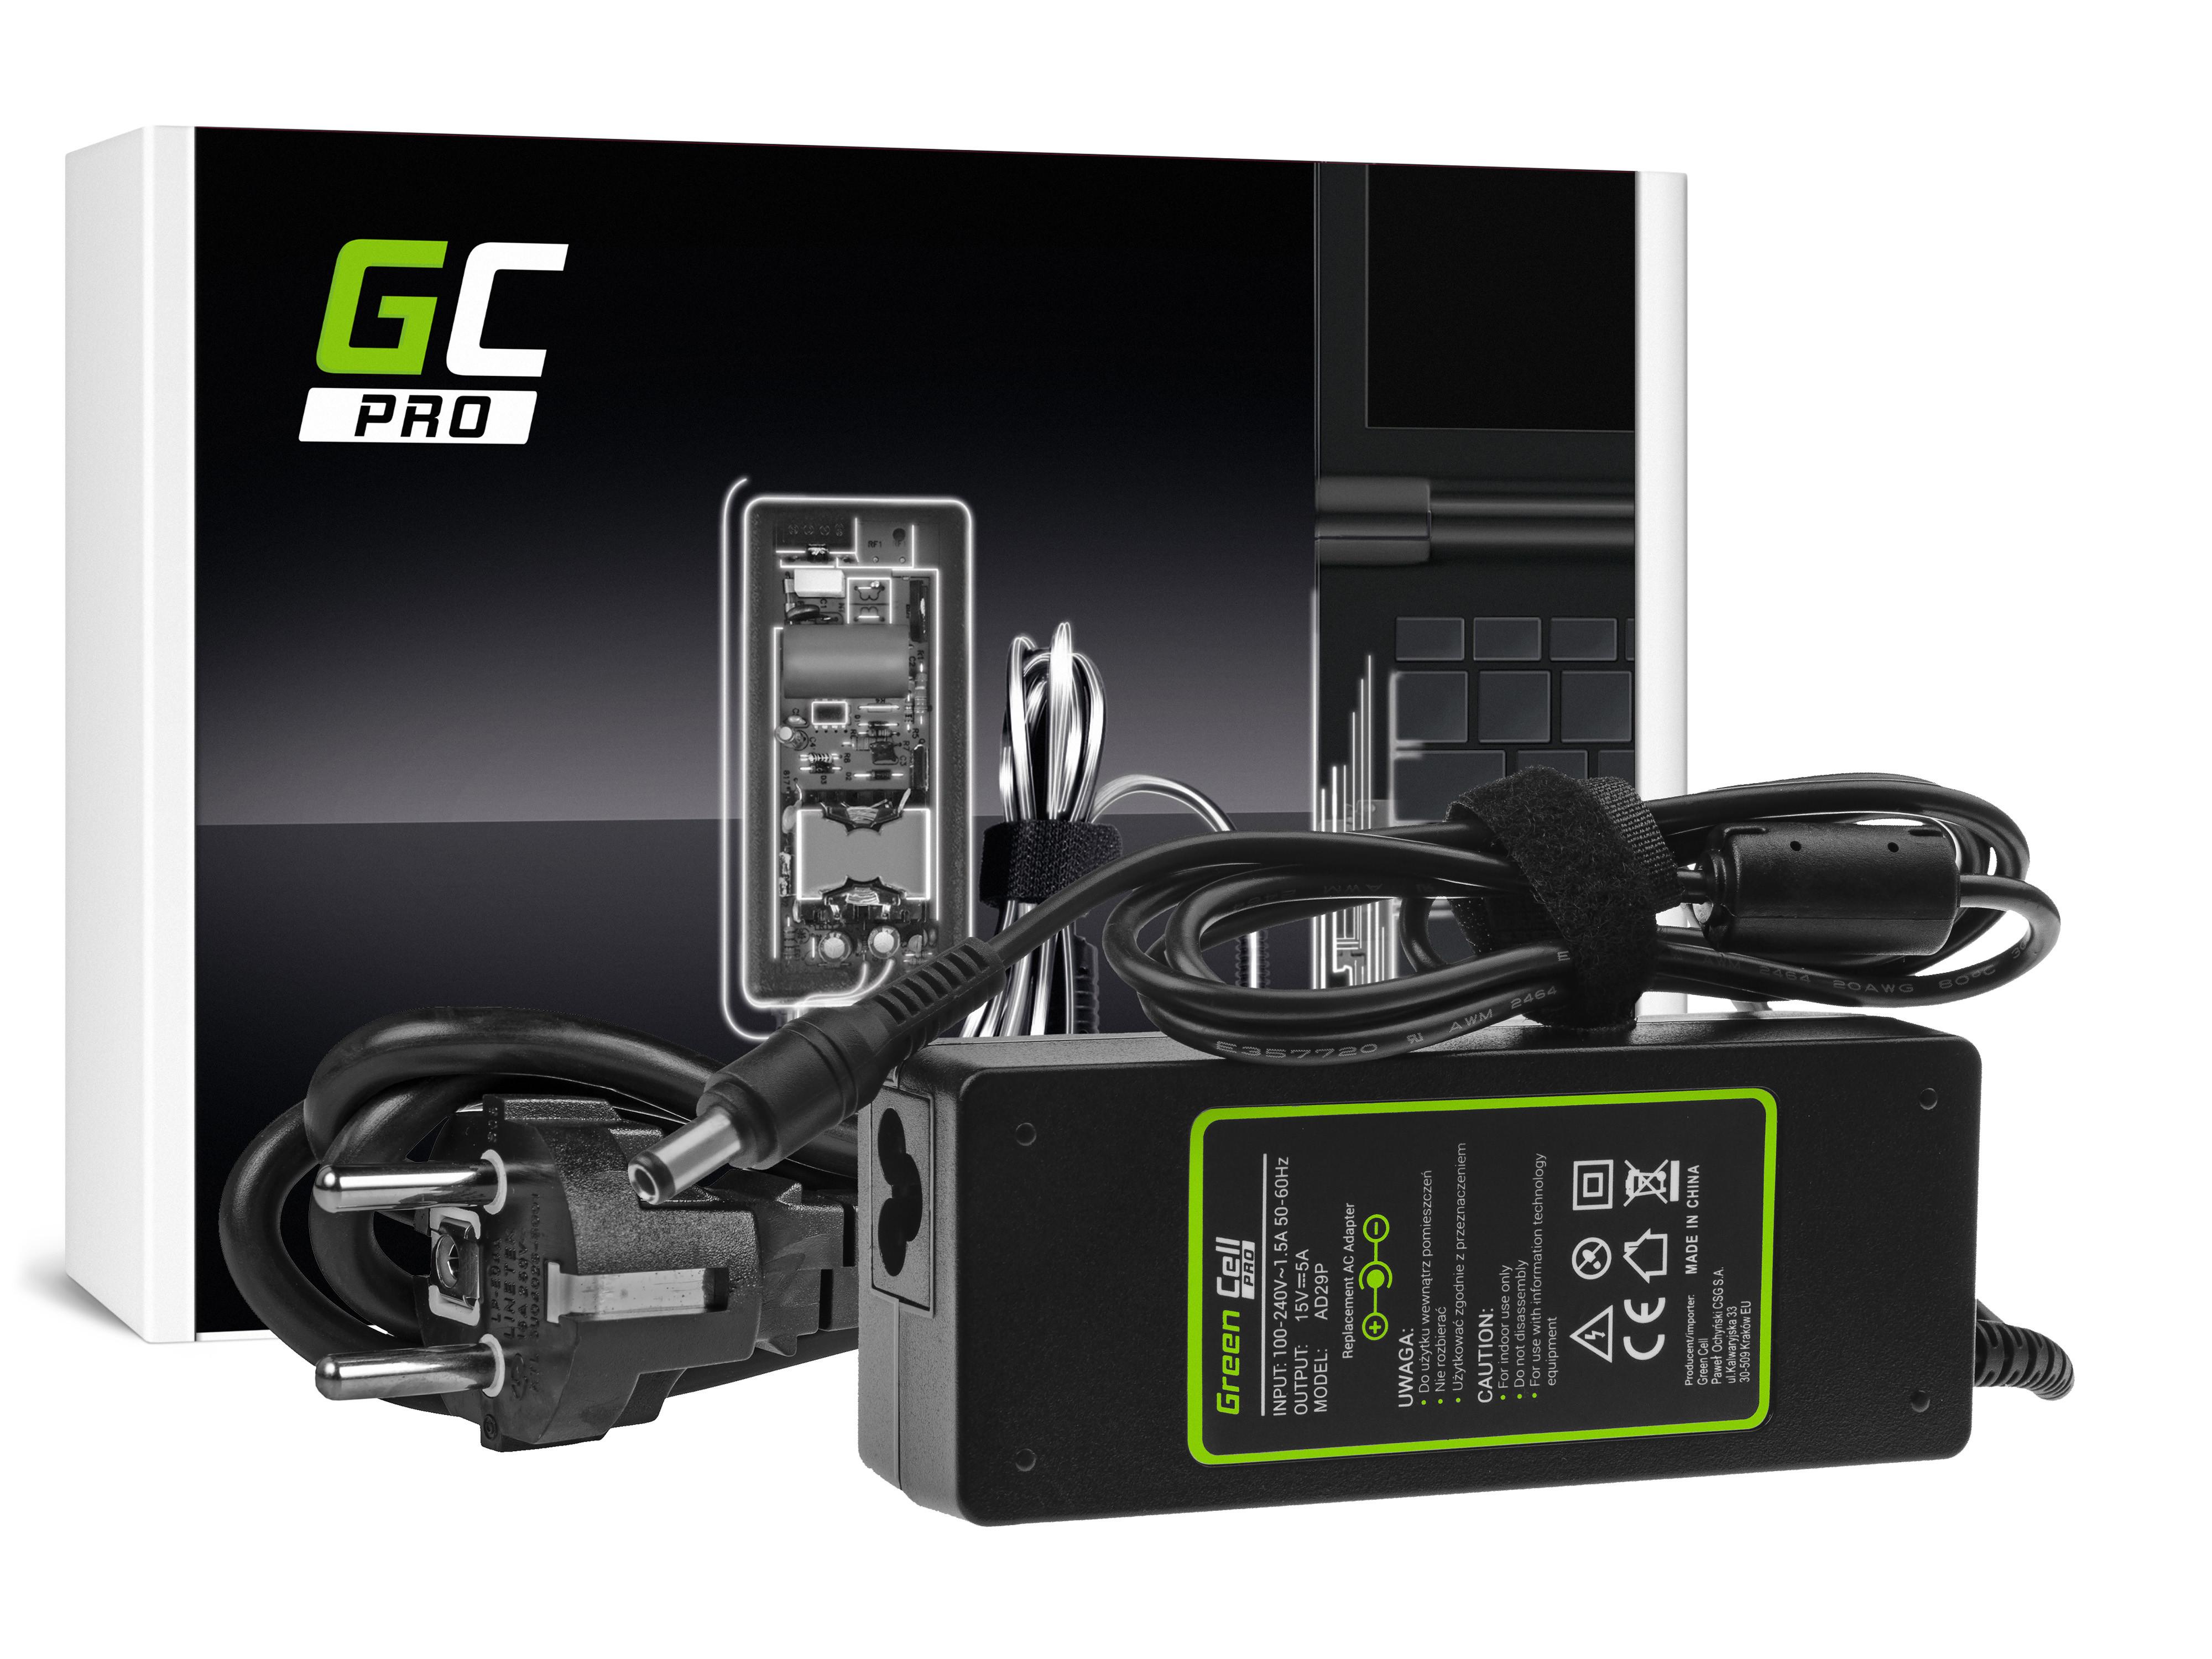 Green Cell AD29P Adaptér Nabíječka pro Toshiba Satellite A100 P100 A105 A110 TECRA A7 A8 A9 A10 15V 5A | 75W | konektor 6.3mm-3.0mm